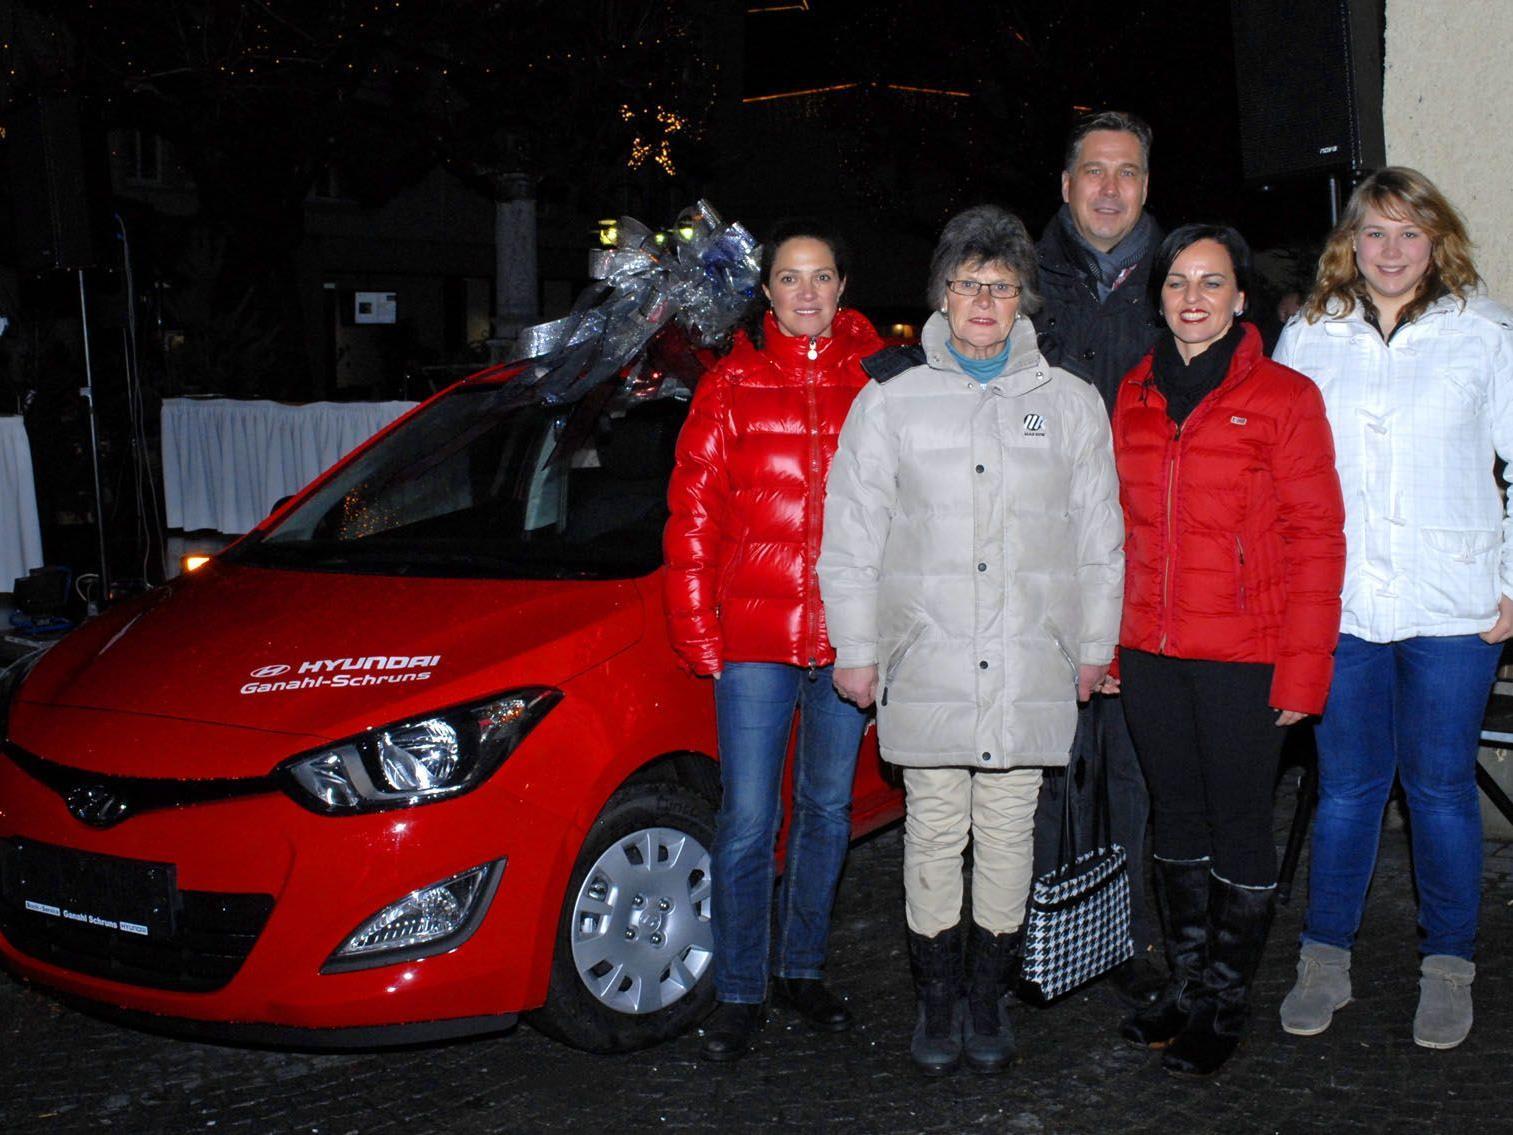 Den Hauptpreis des WIGE-Adventgewinnspieles, ein Hyundai i20, gewann Frau Edelburg Kogler (2. v. l.) aus Bartholomäberg.